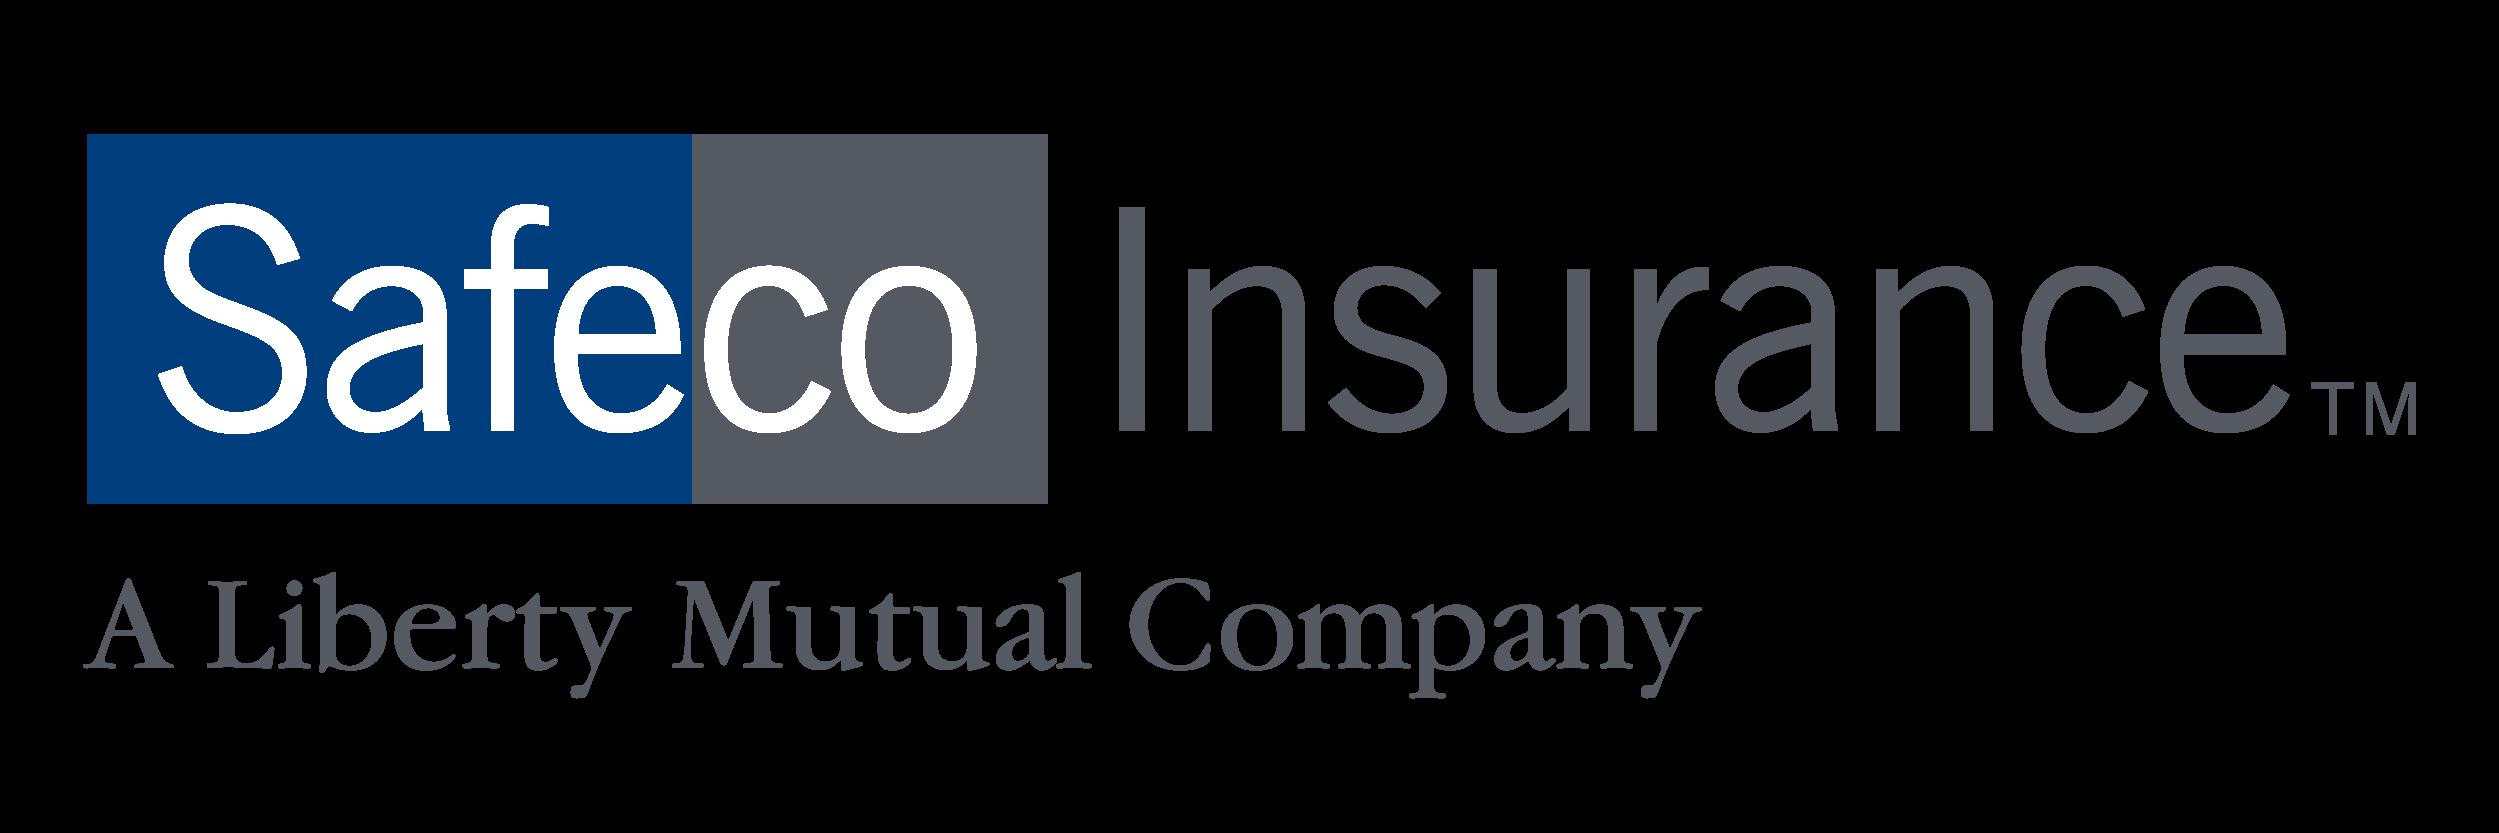 Safeco-Insurance-Logo.png